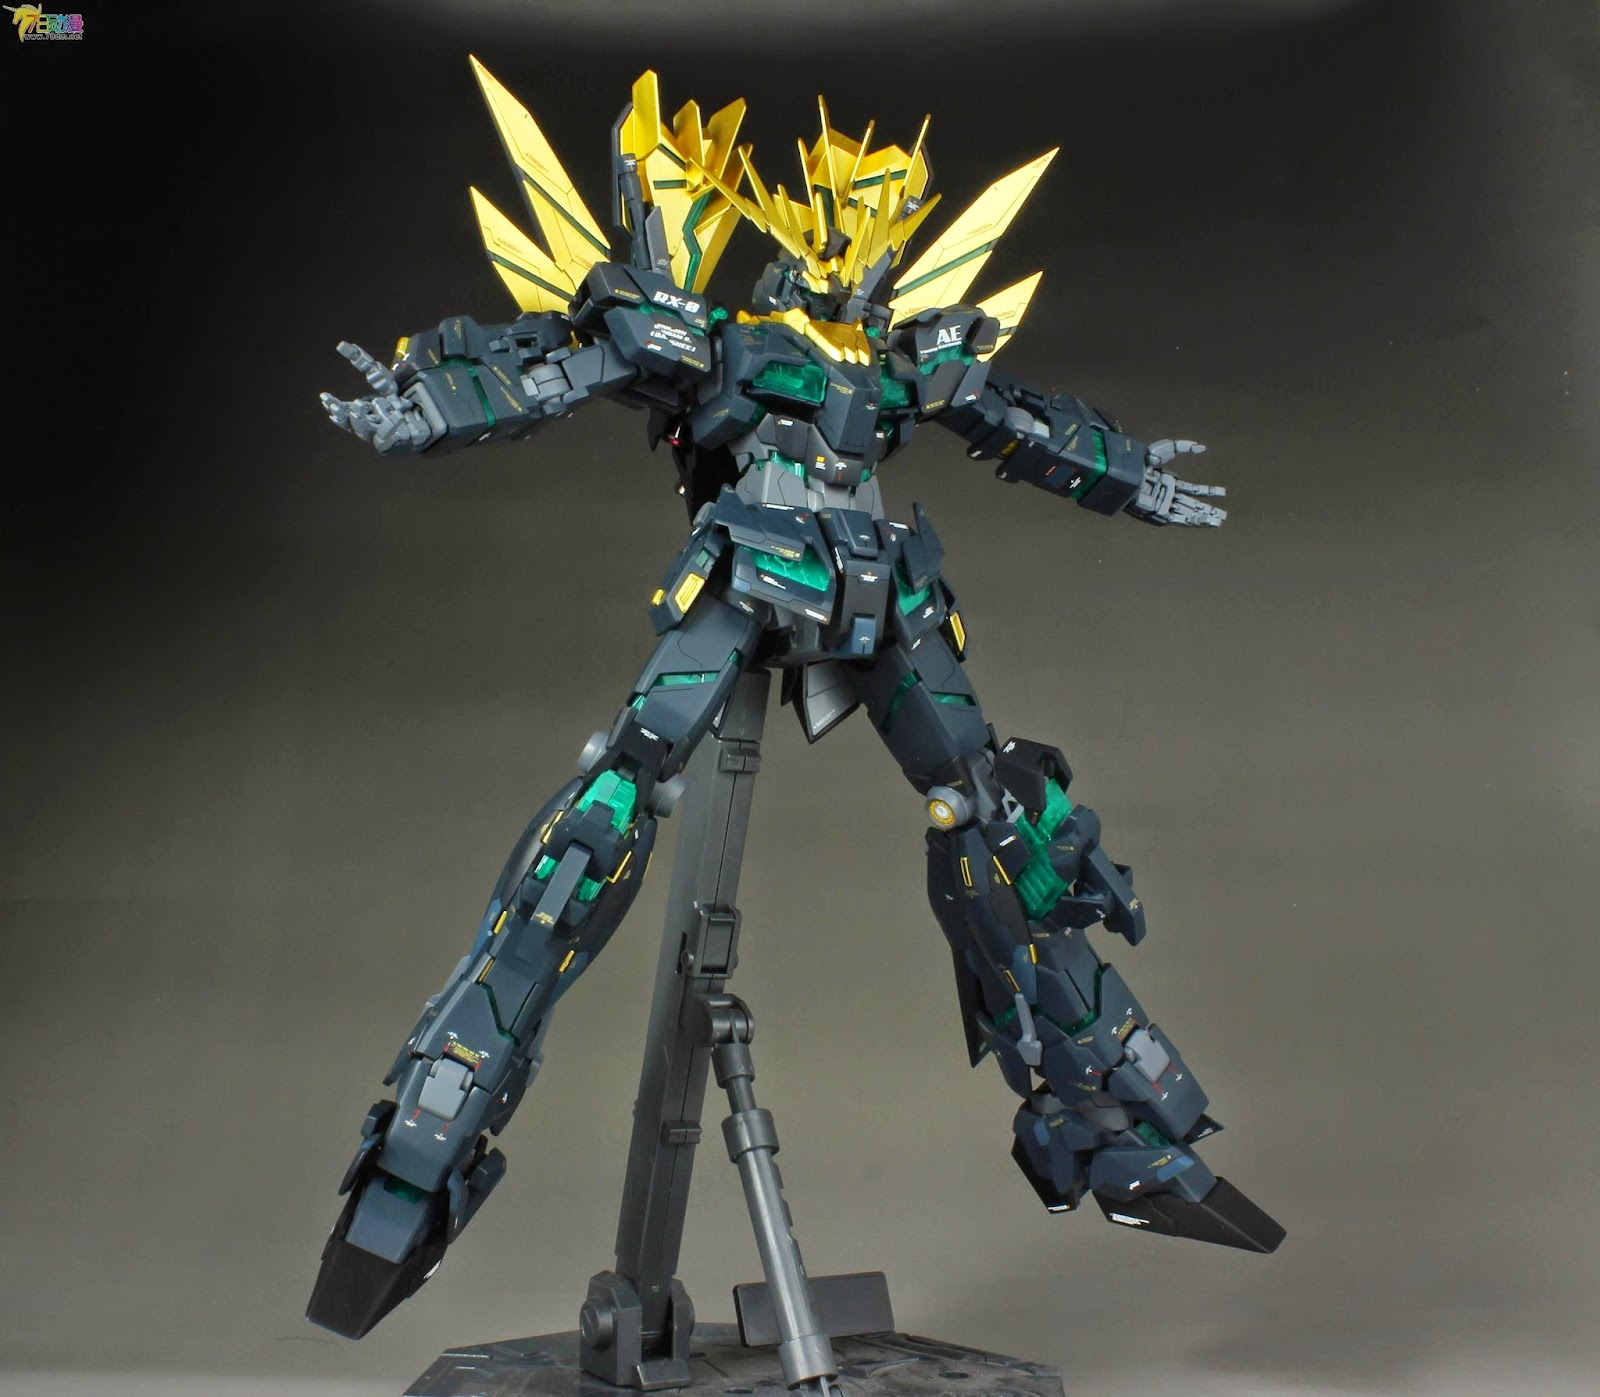 Gundam Family: MG 1/100 Unicorn Gundam 02 Banshee Norn ...